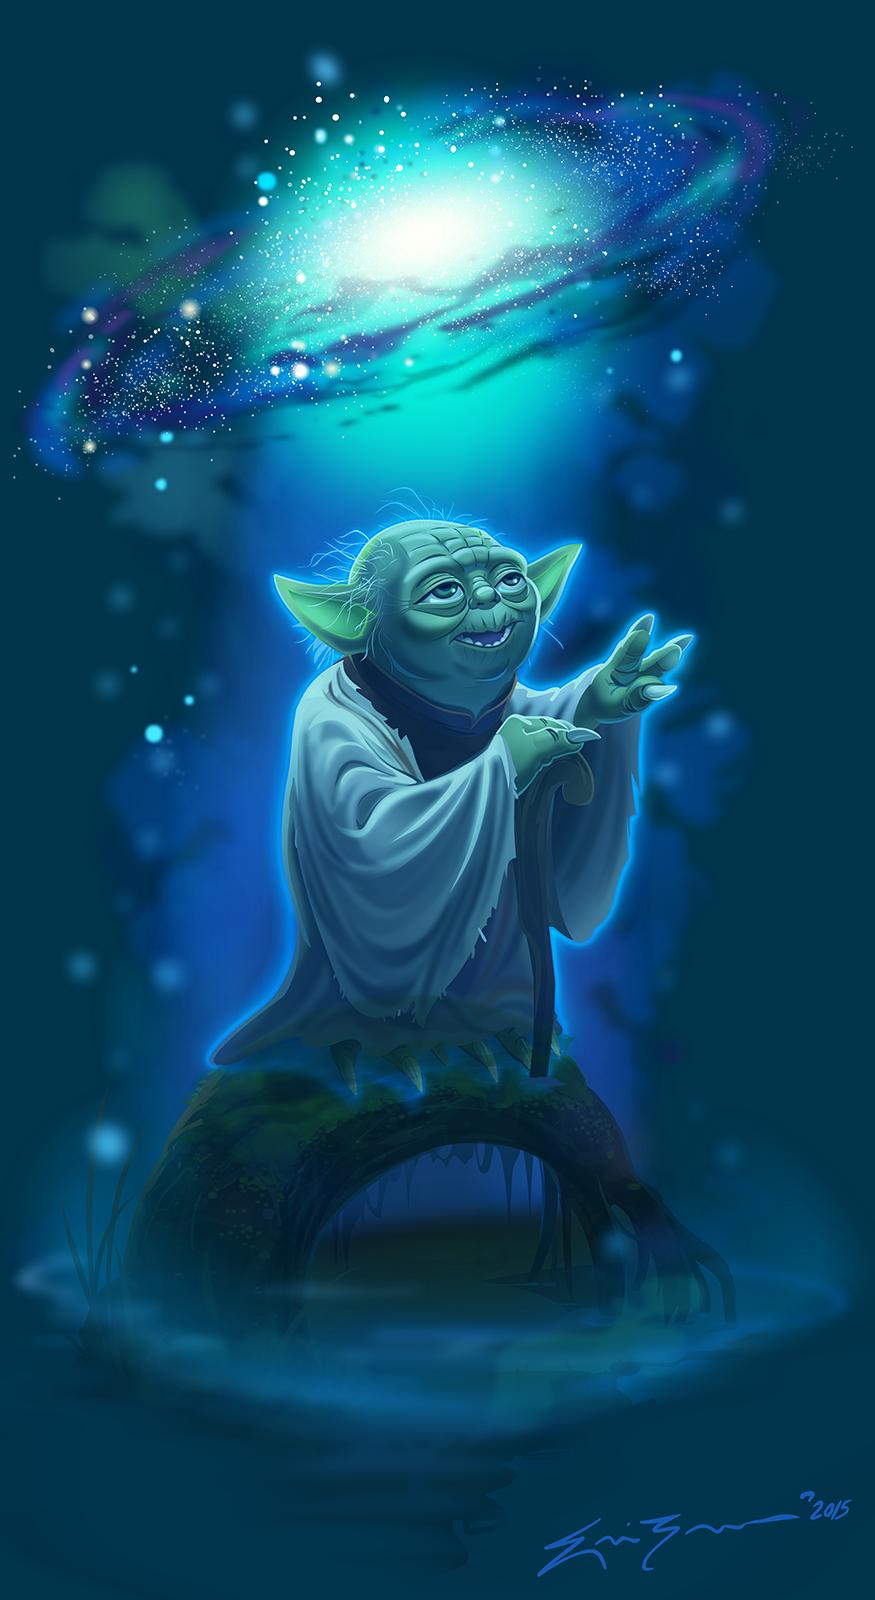 Yoda2015ghost_72dpi